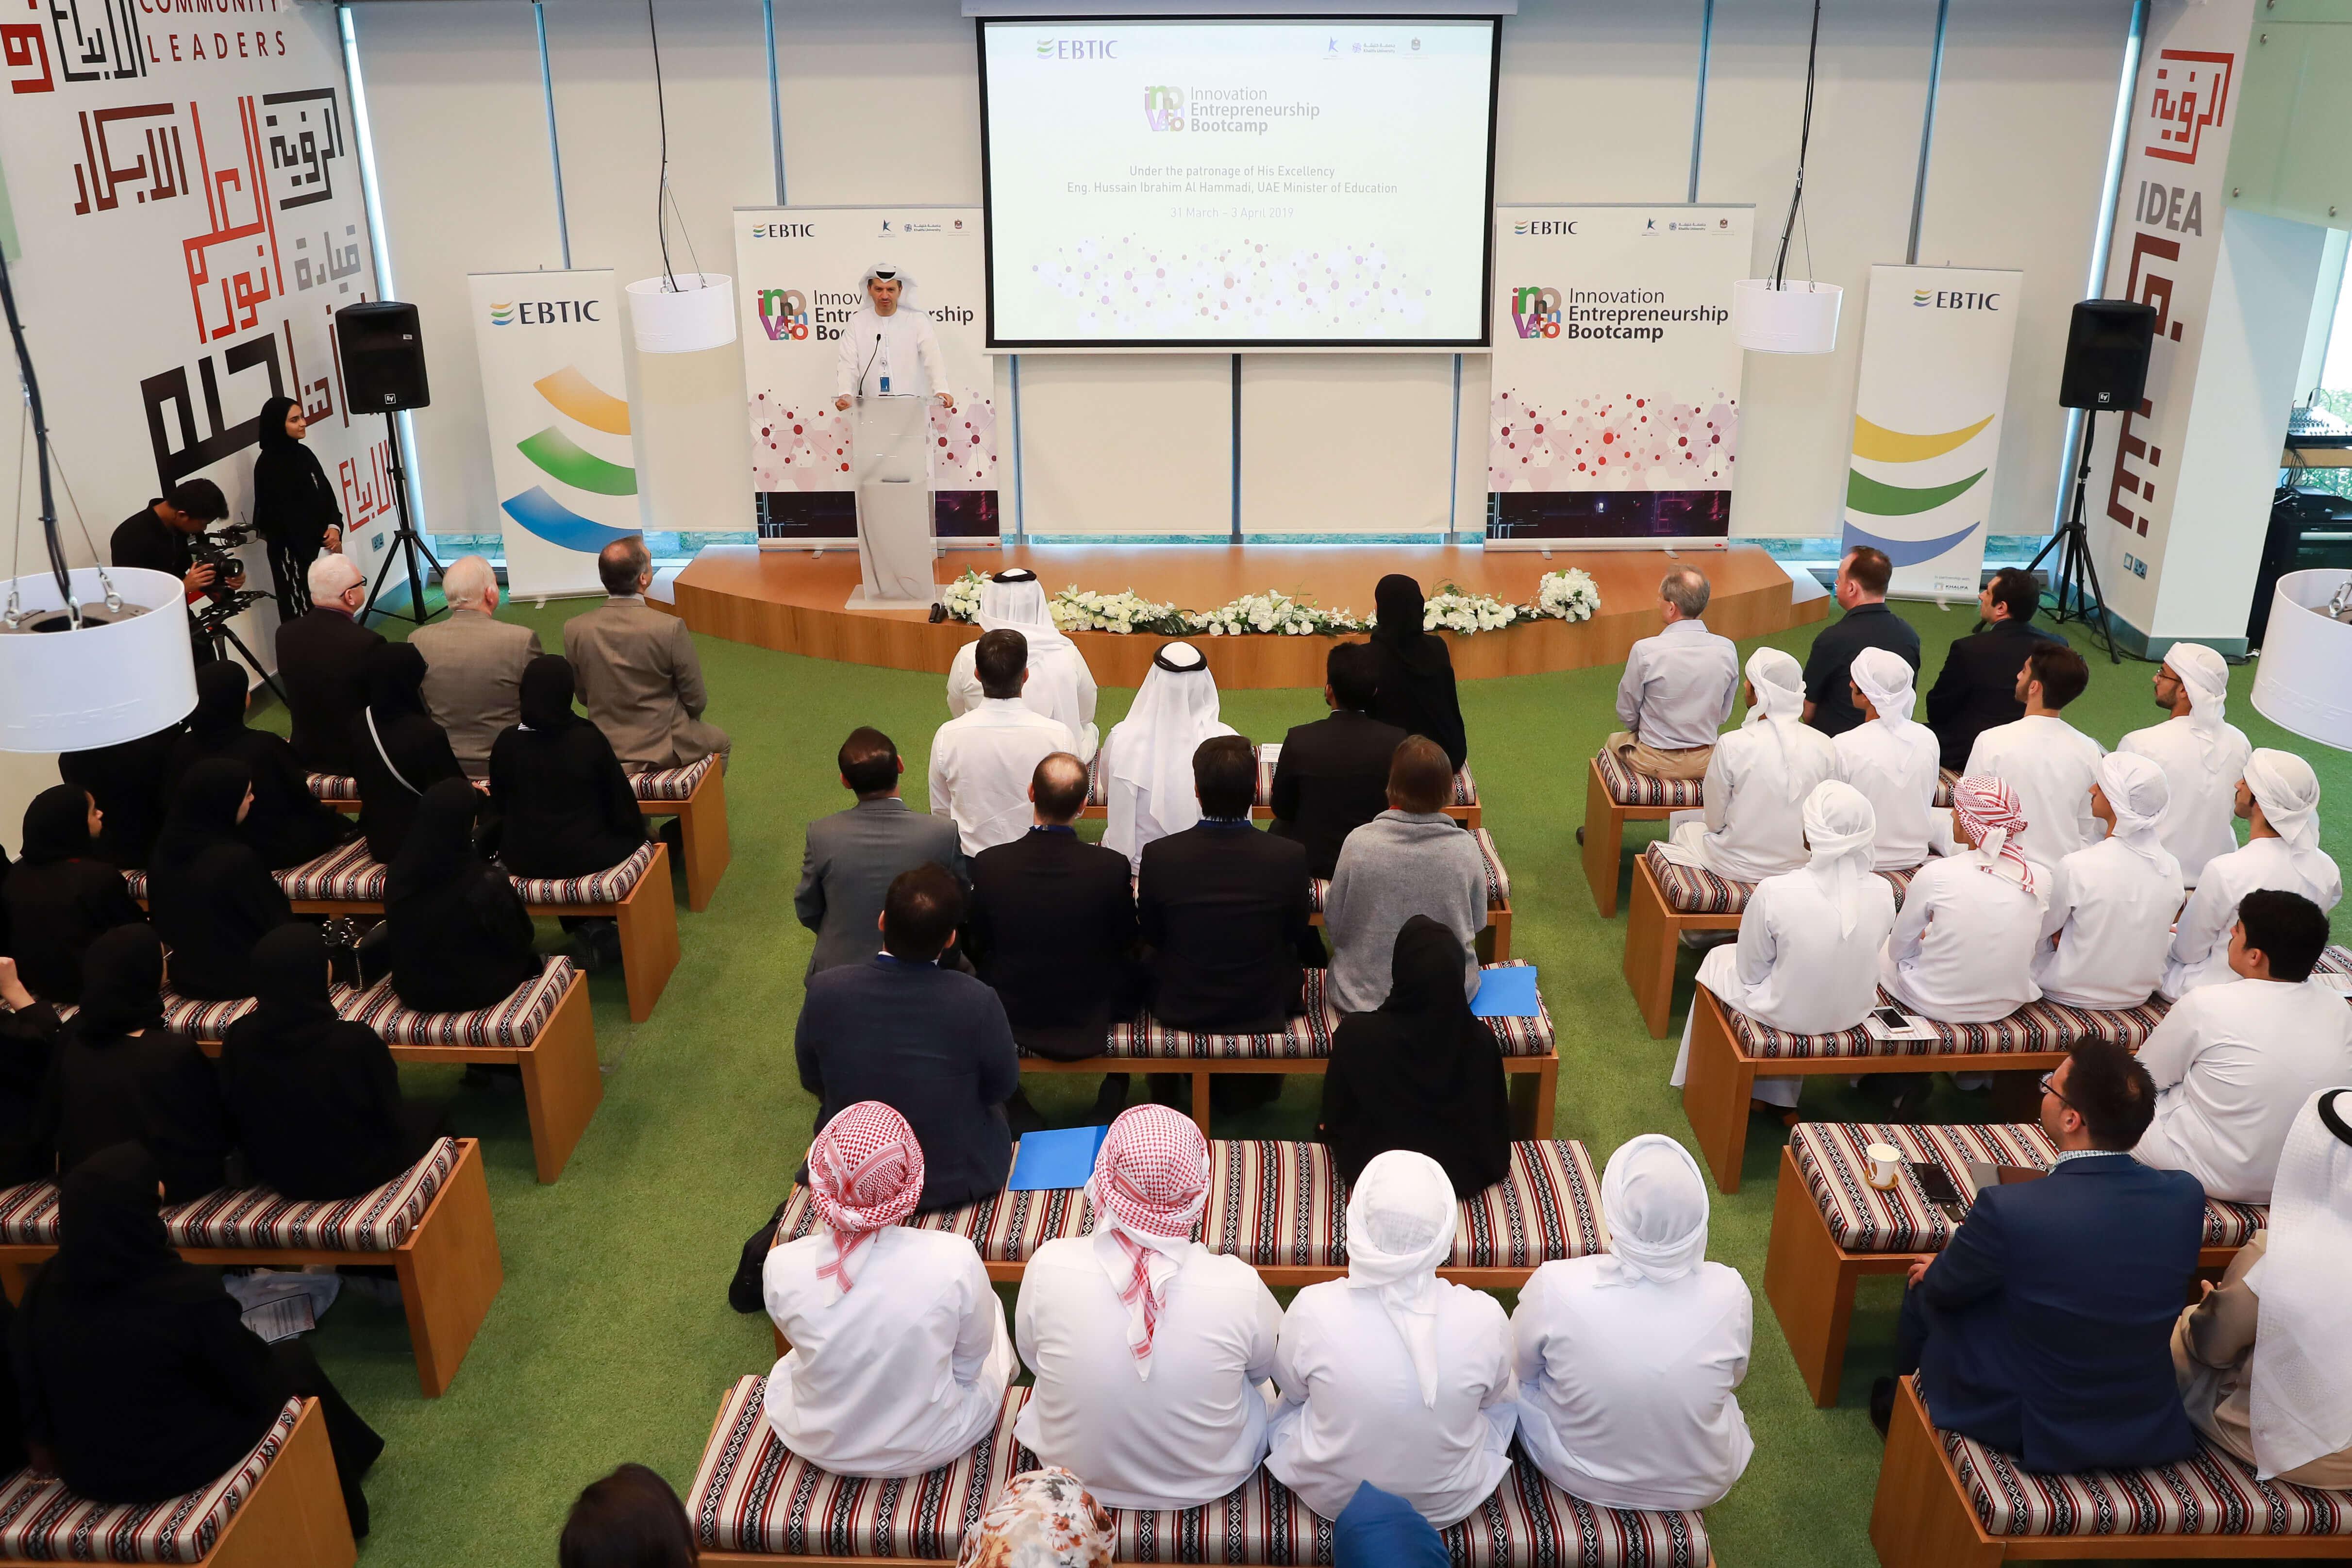 EBTIC bootcamp fuels innovation and entrepreneurship among UAE youth